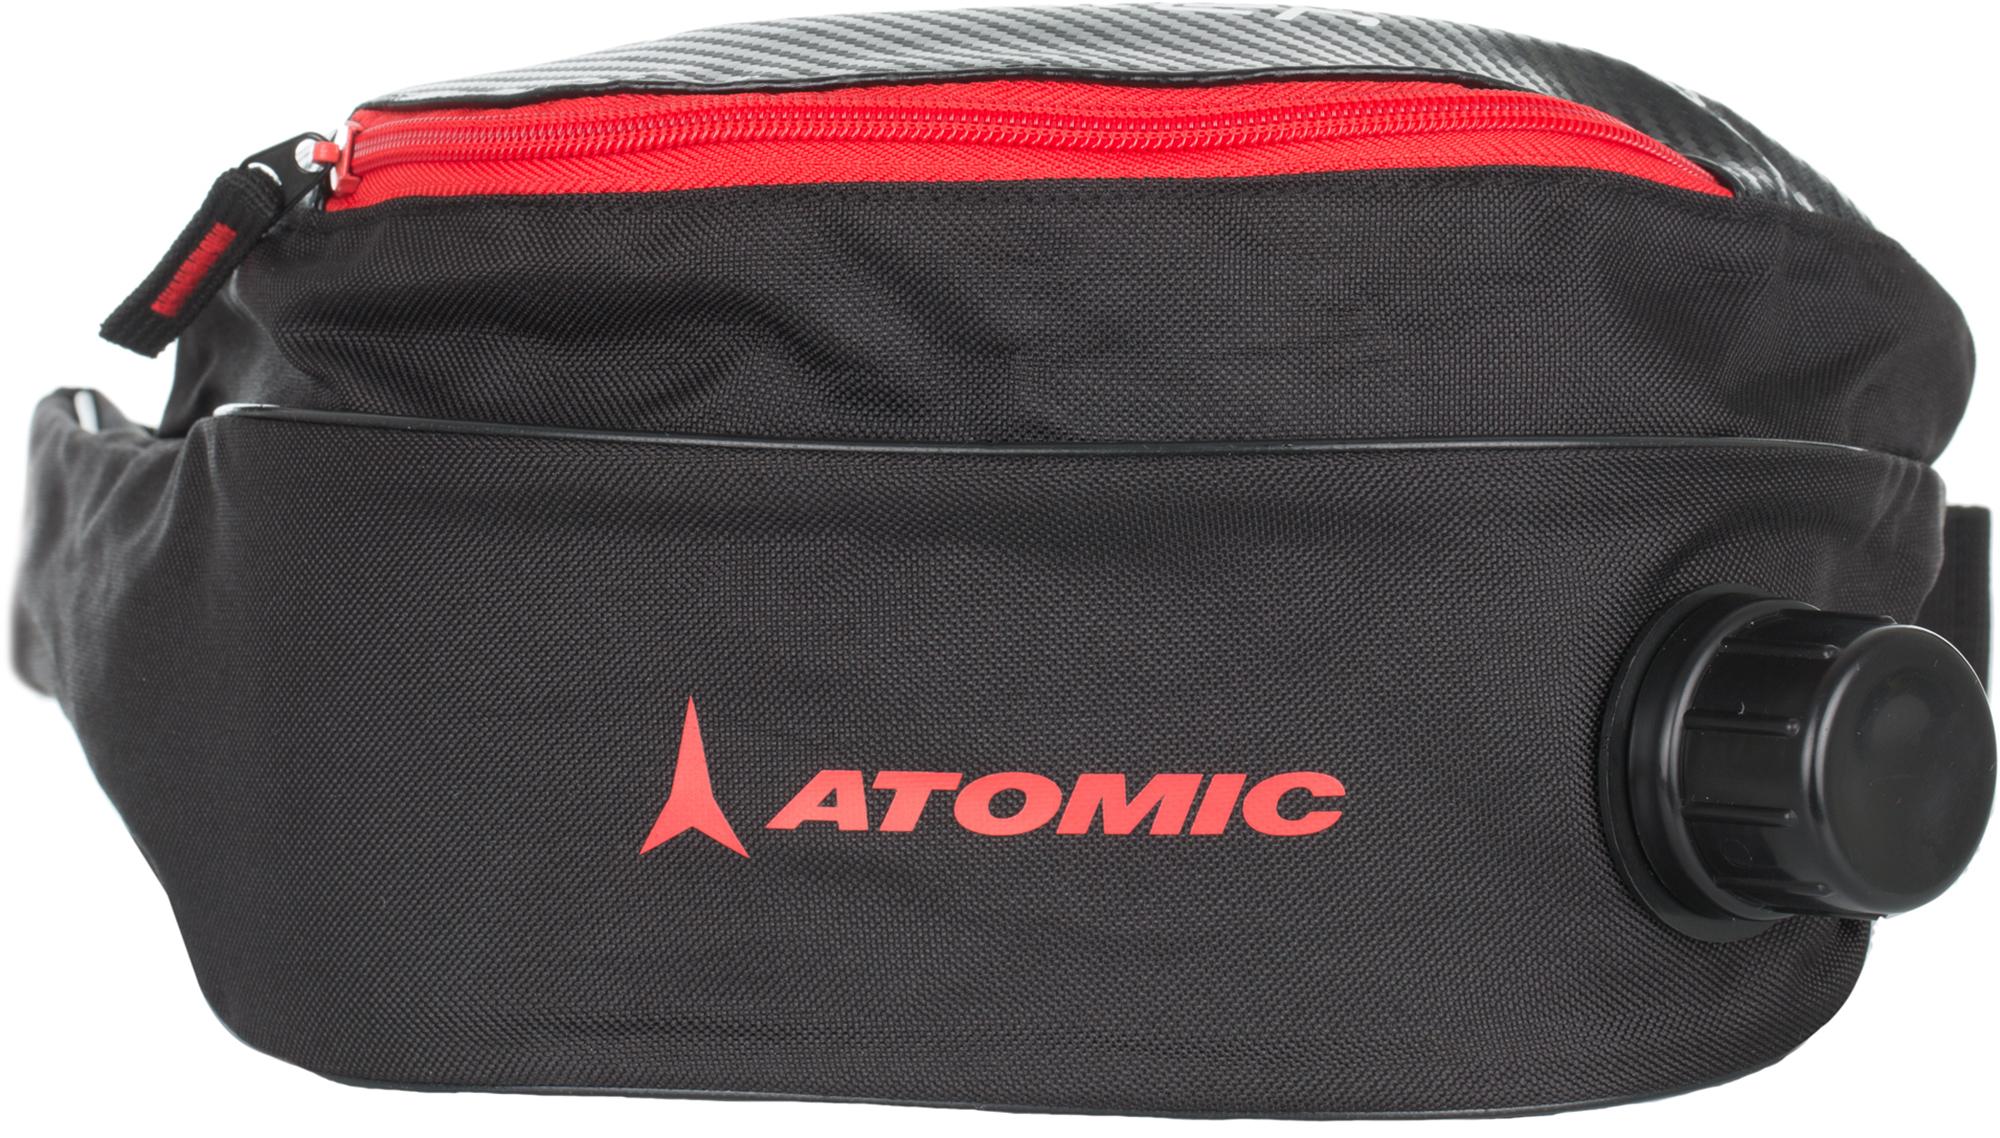 Atomic Сумка на пояс Atomic цена